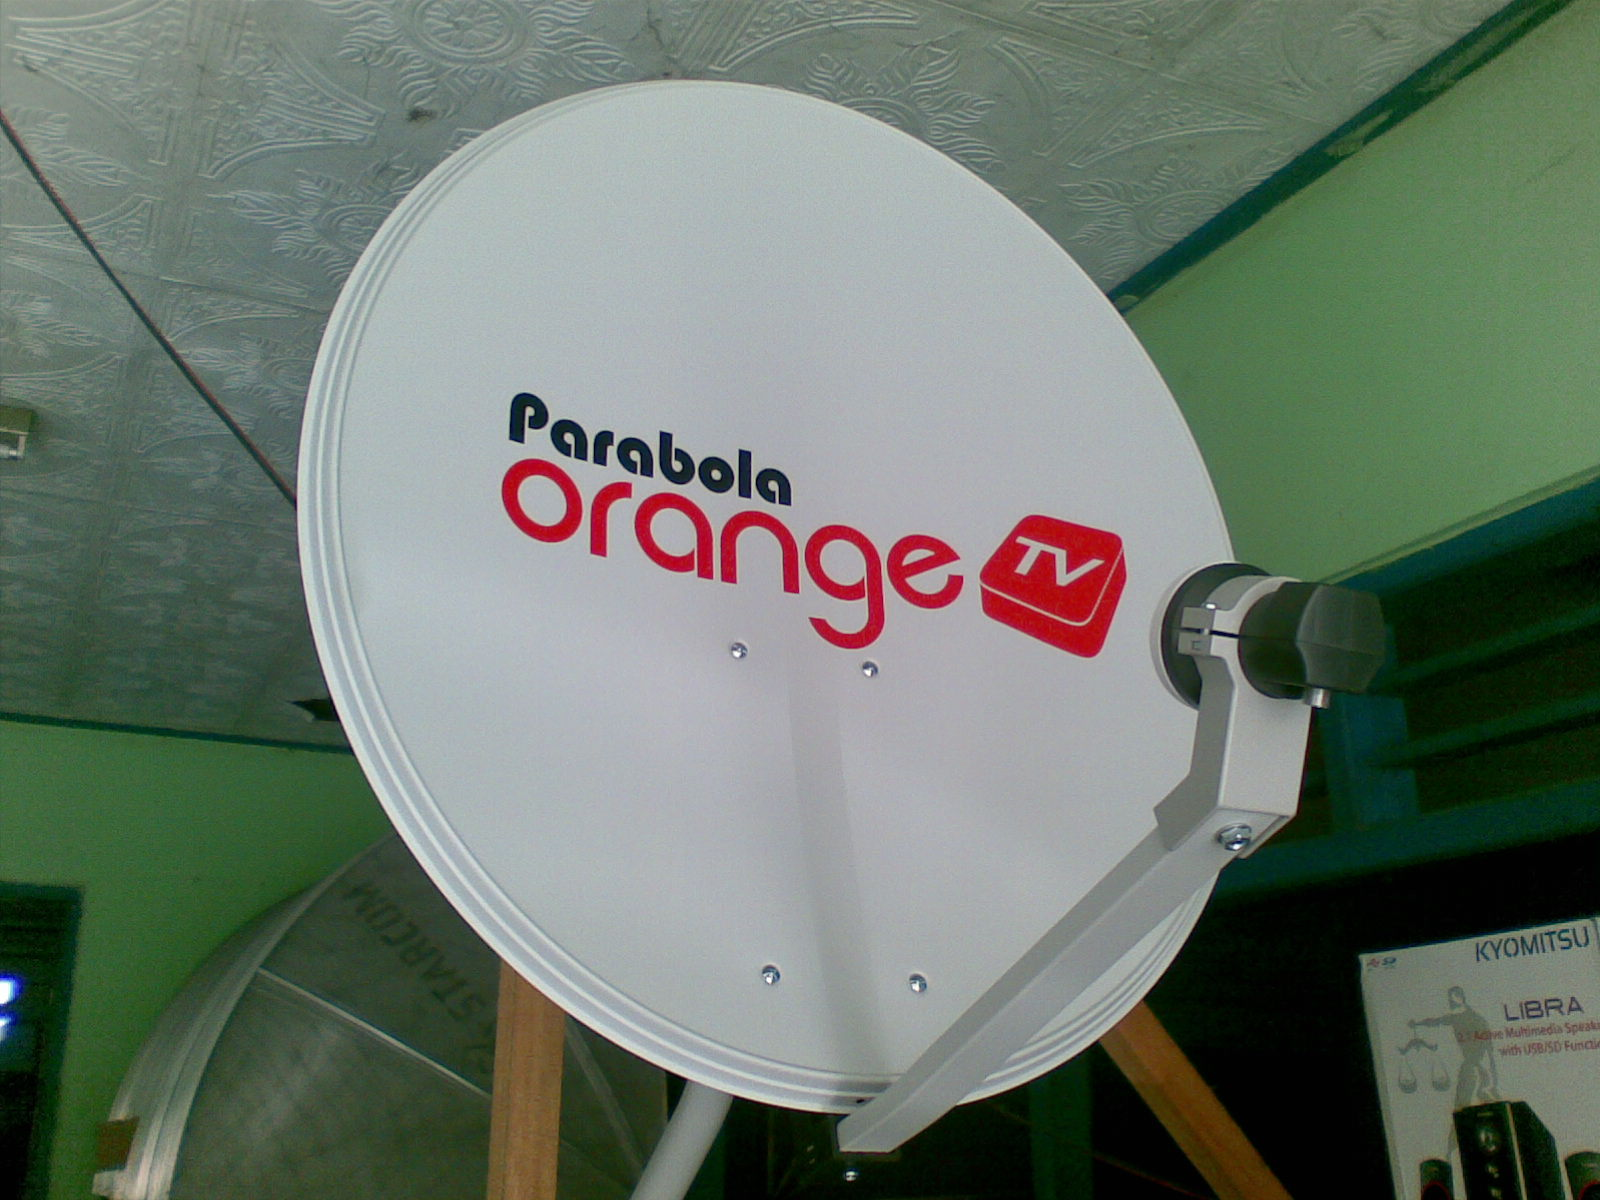 bsr parabola Gombong ,Kebumen: PARABOLA ORANGE TV